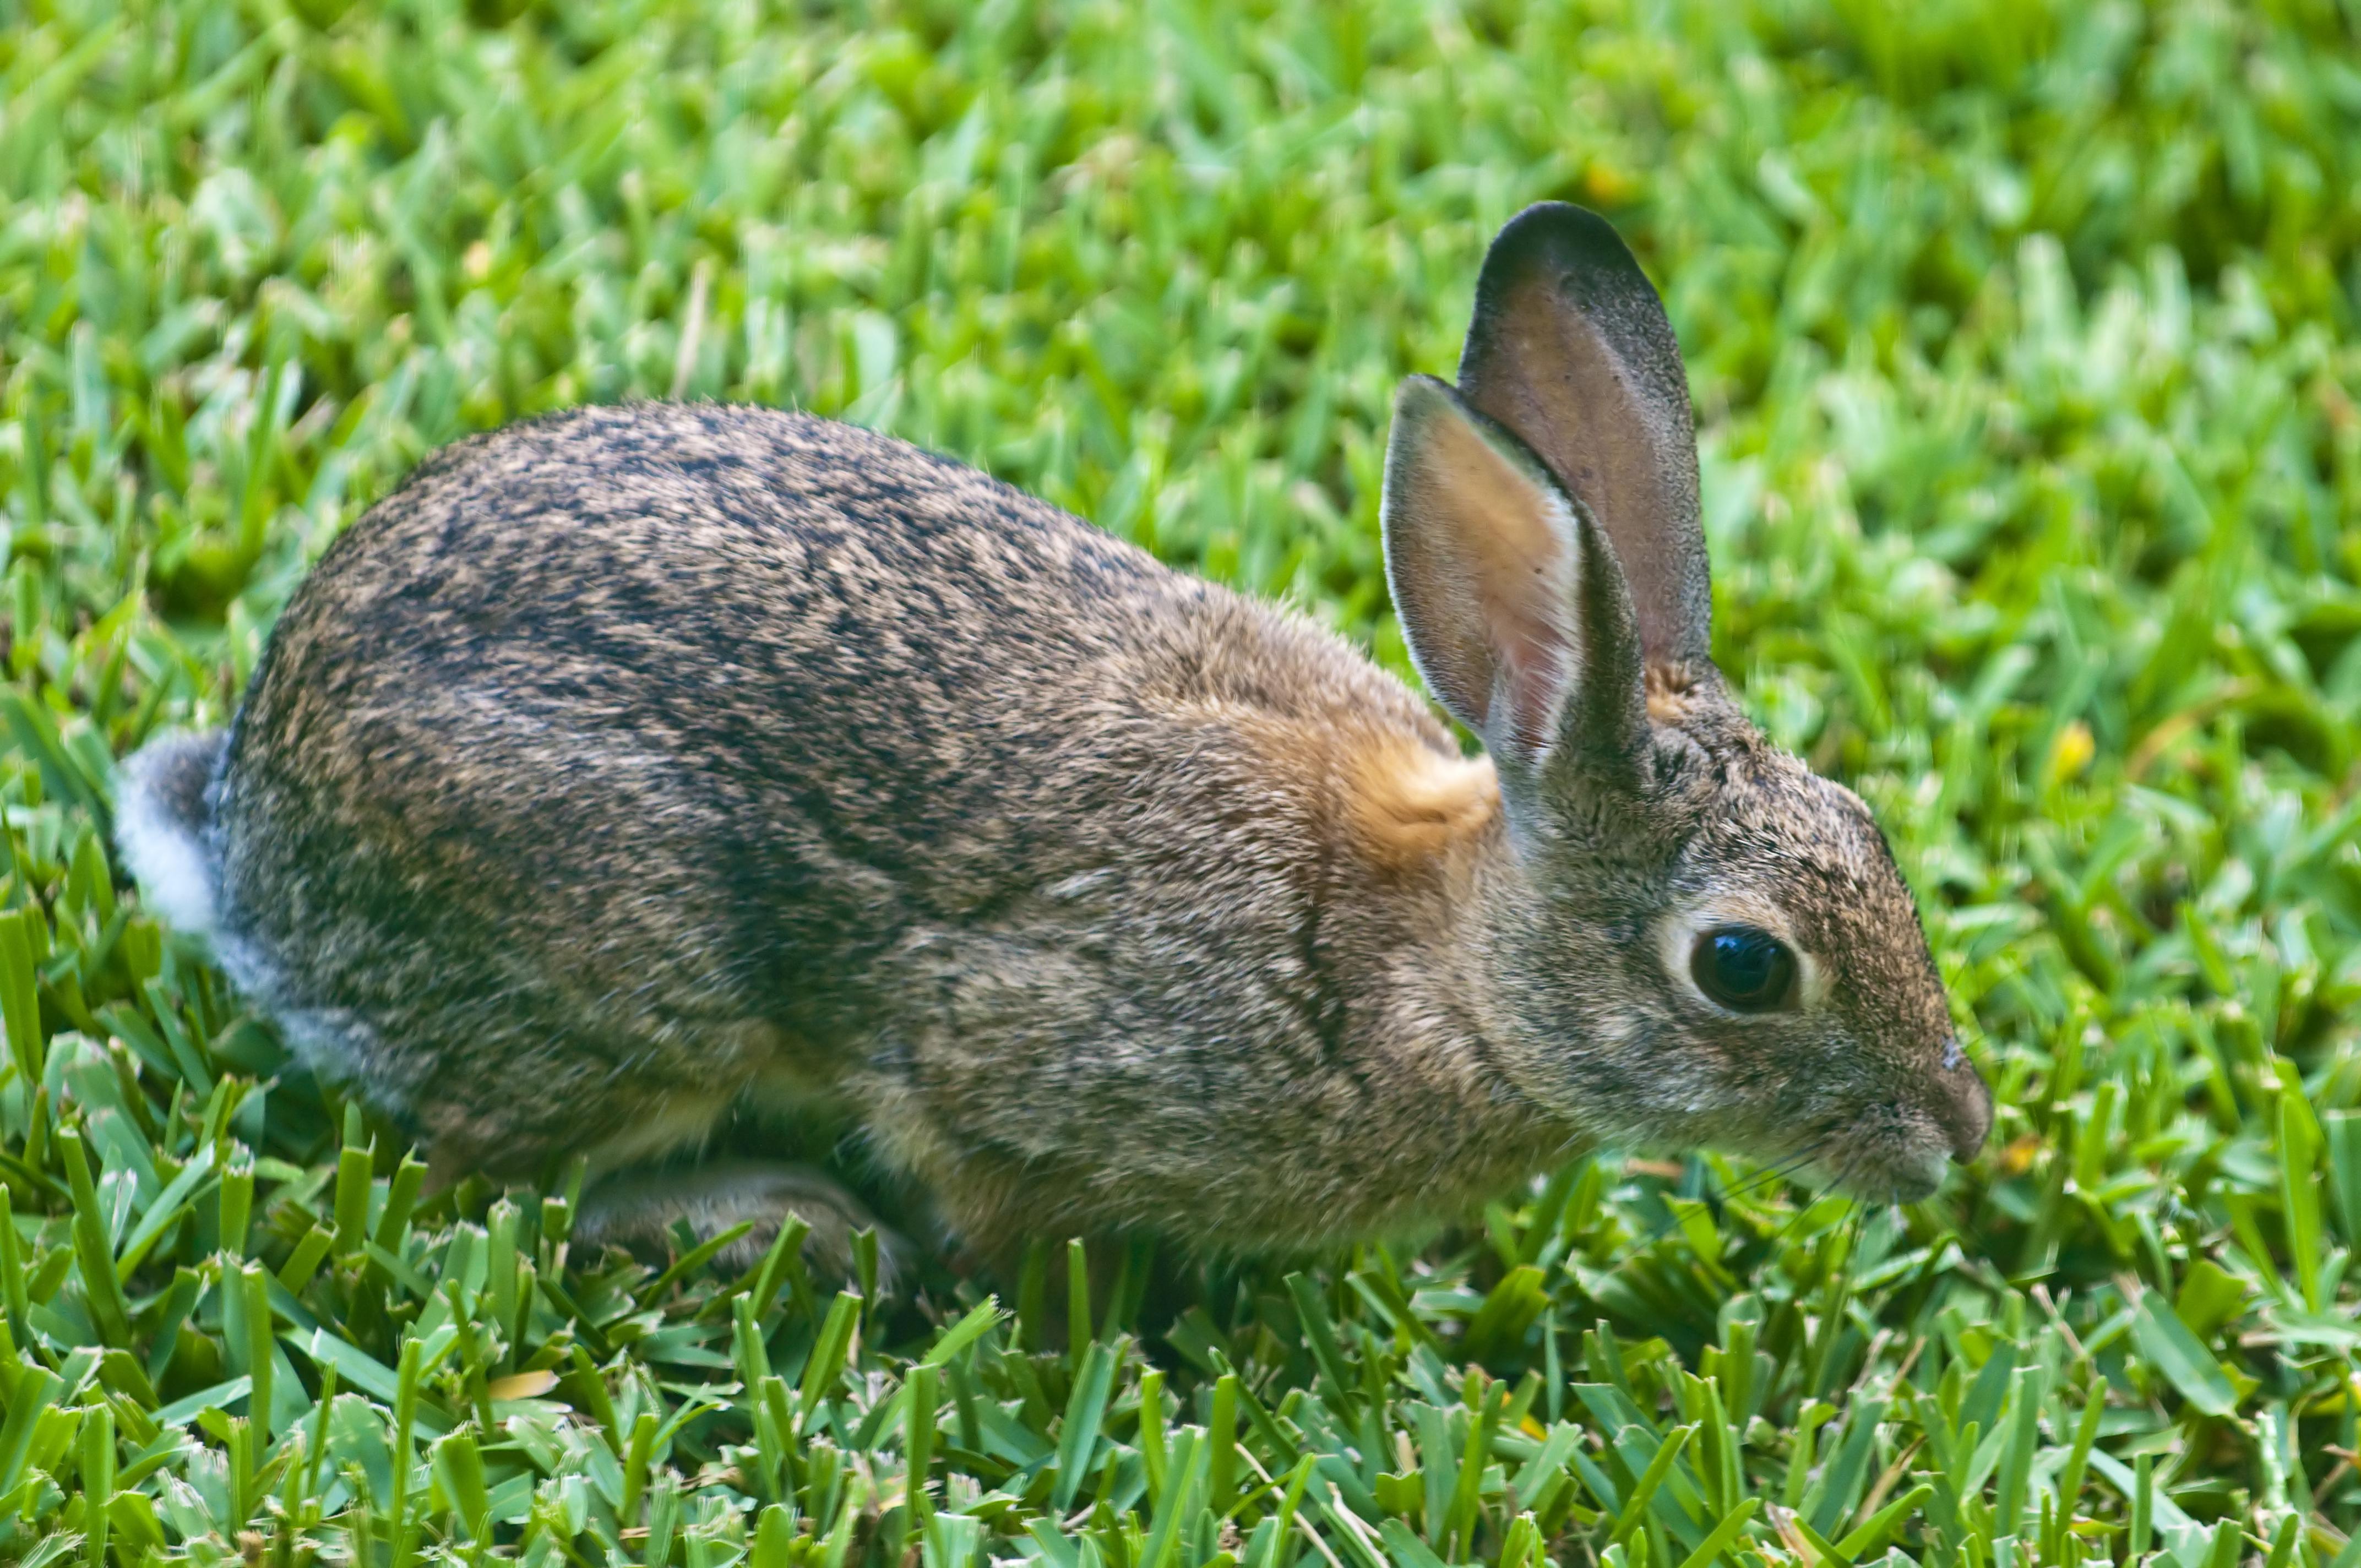 File:Rabbit in the Backyard.jpg - Wikimedia Commons